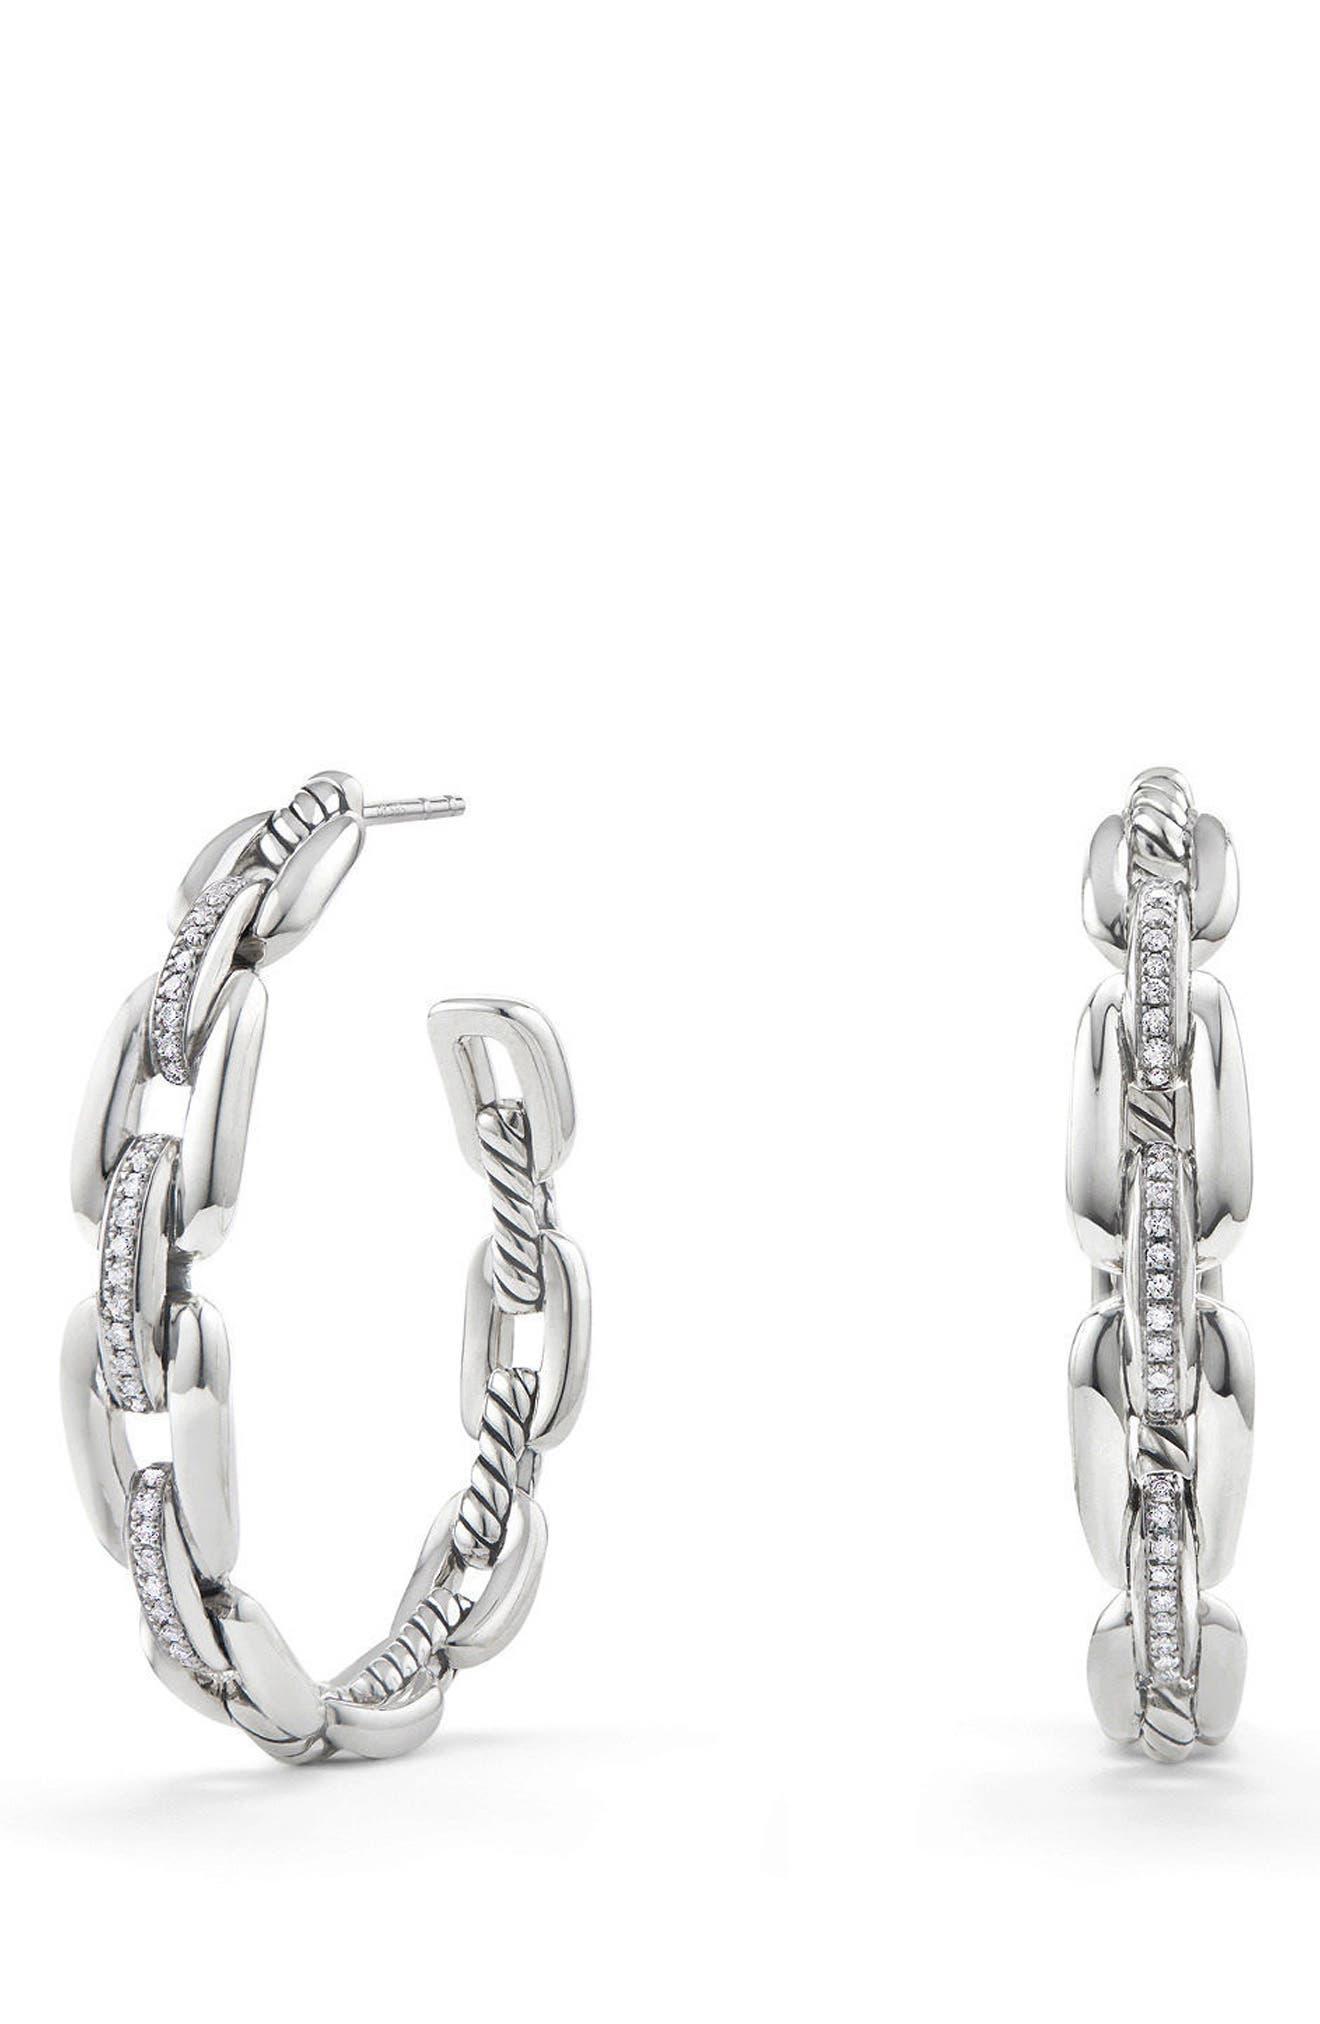 Wellesley 23mm Hoop Earrings with Diamonds,                             Main thumbnail 1, color,                             SILVER